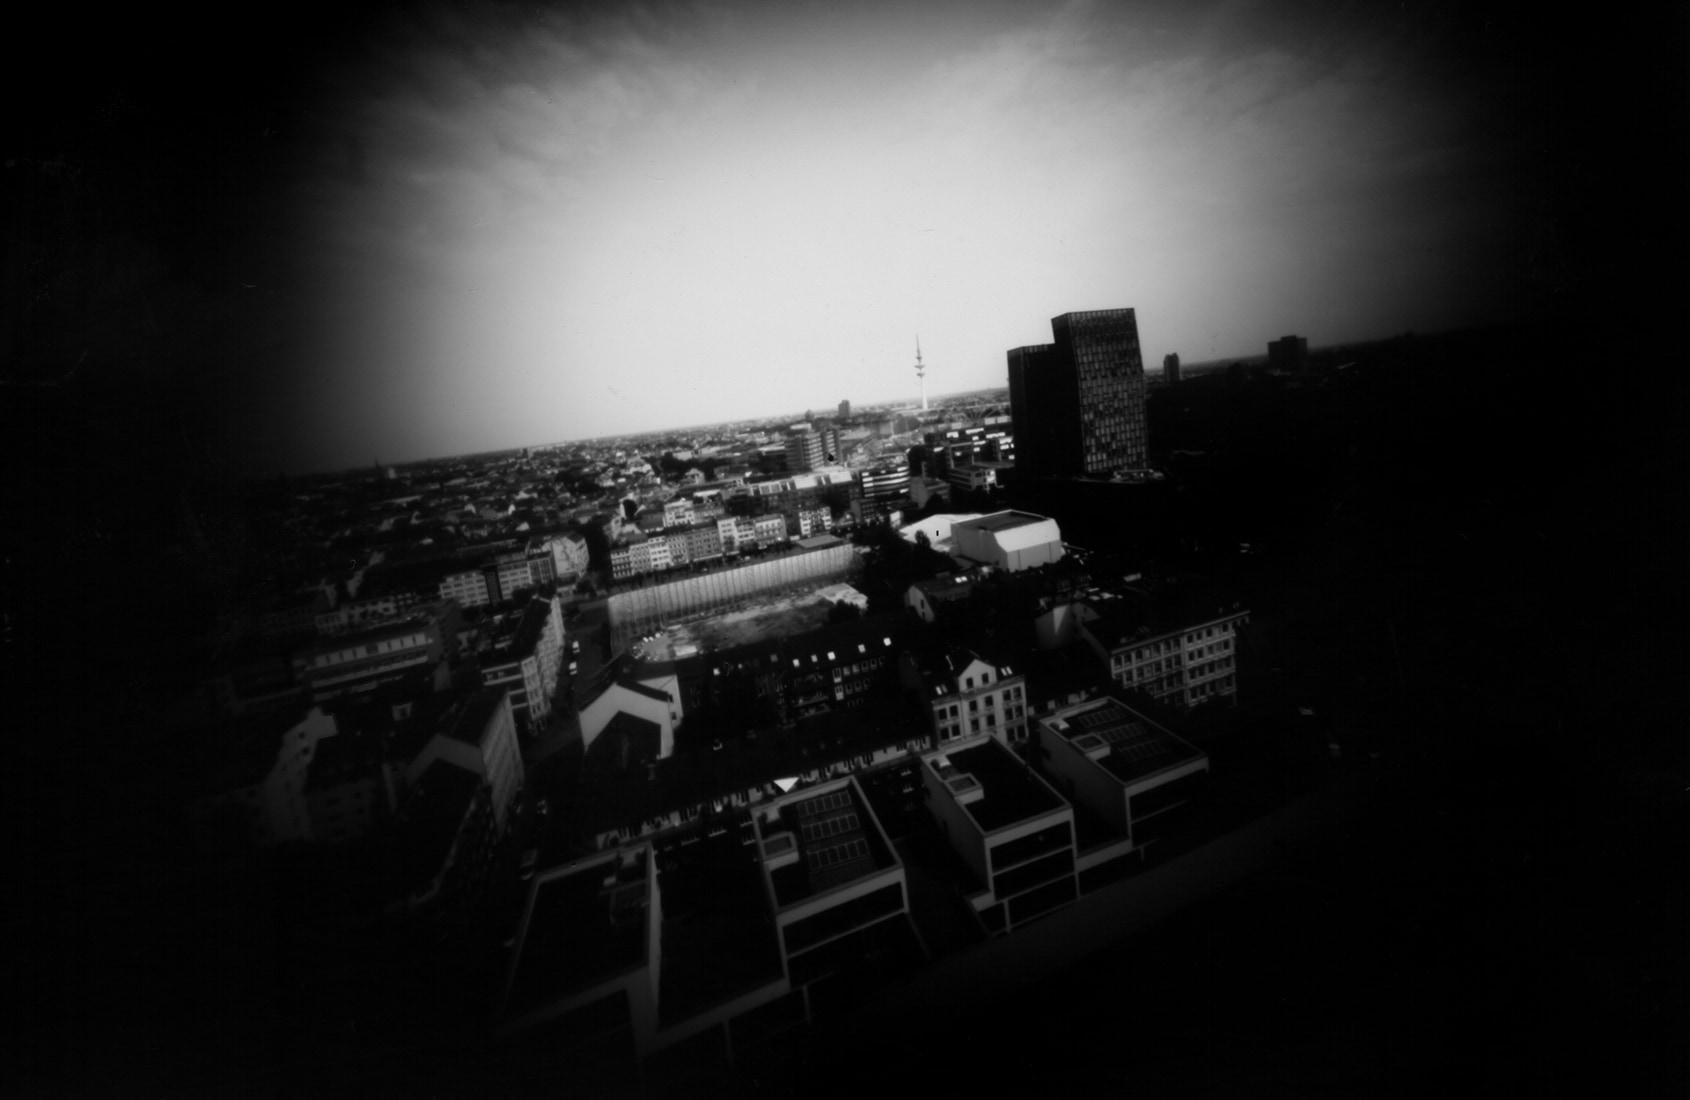 Hamburg, St. Pauli von oben fotografiert, Lochkamera Fotografie